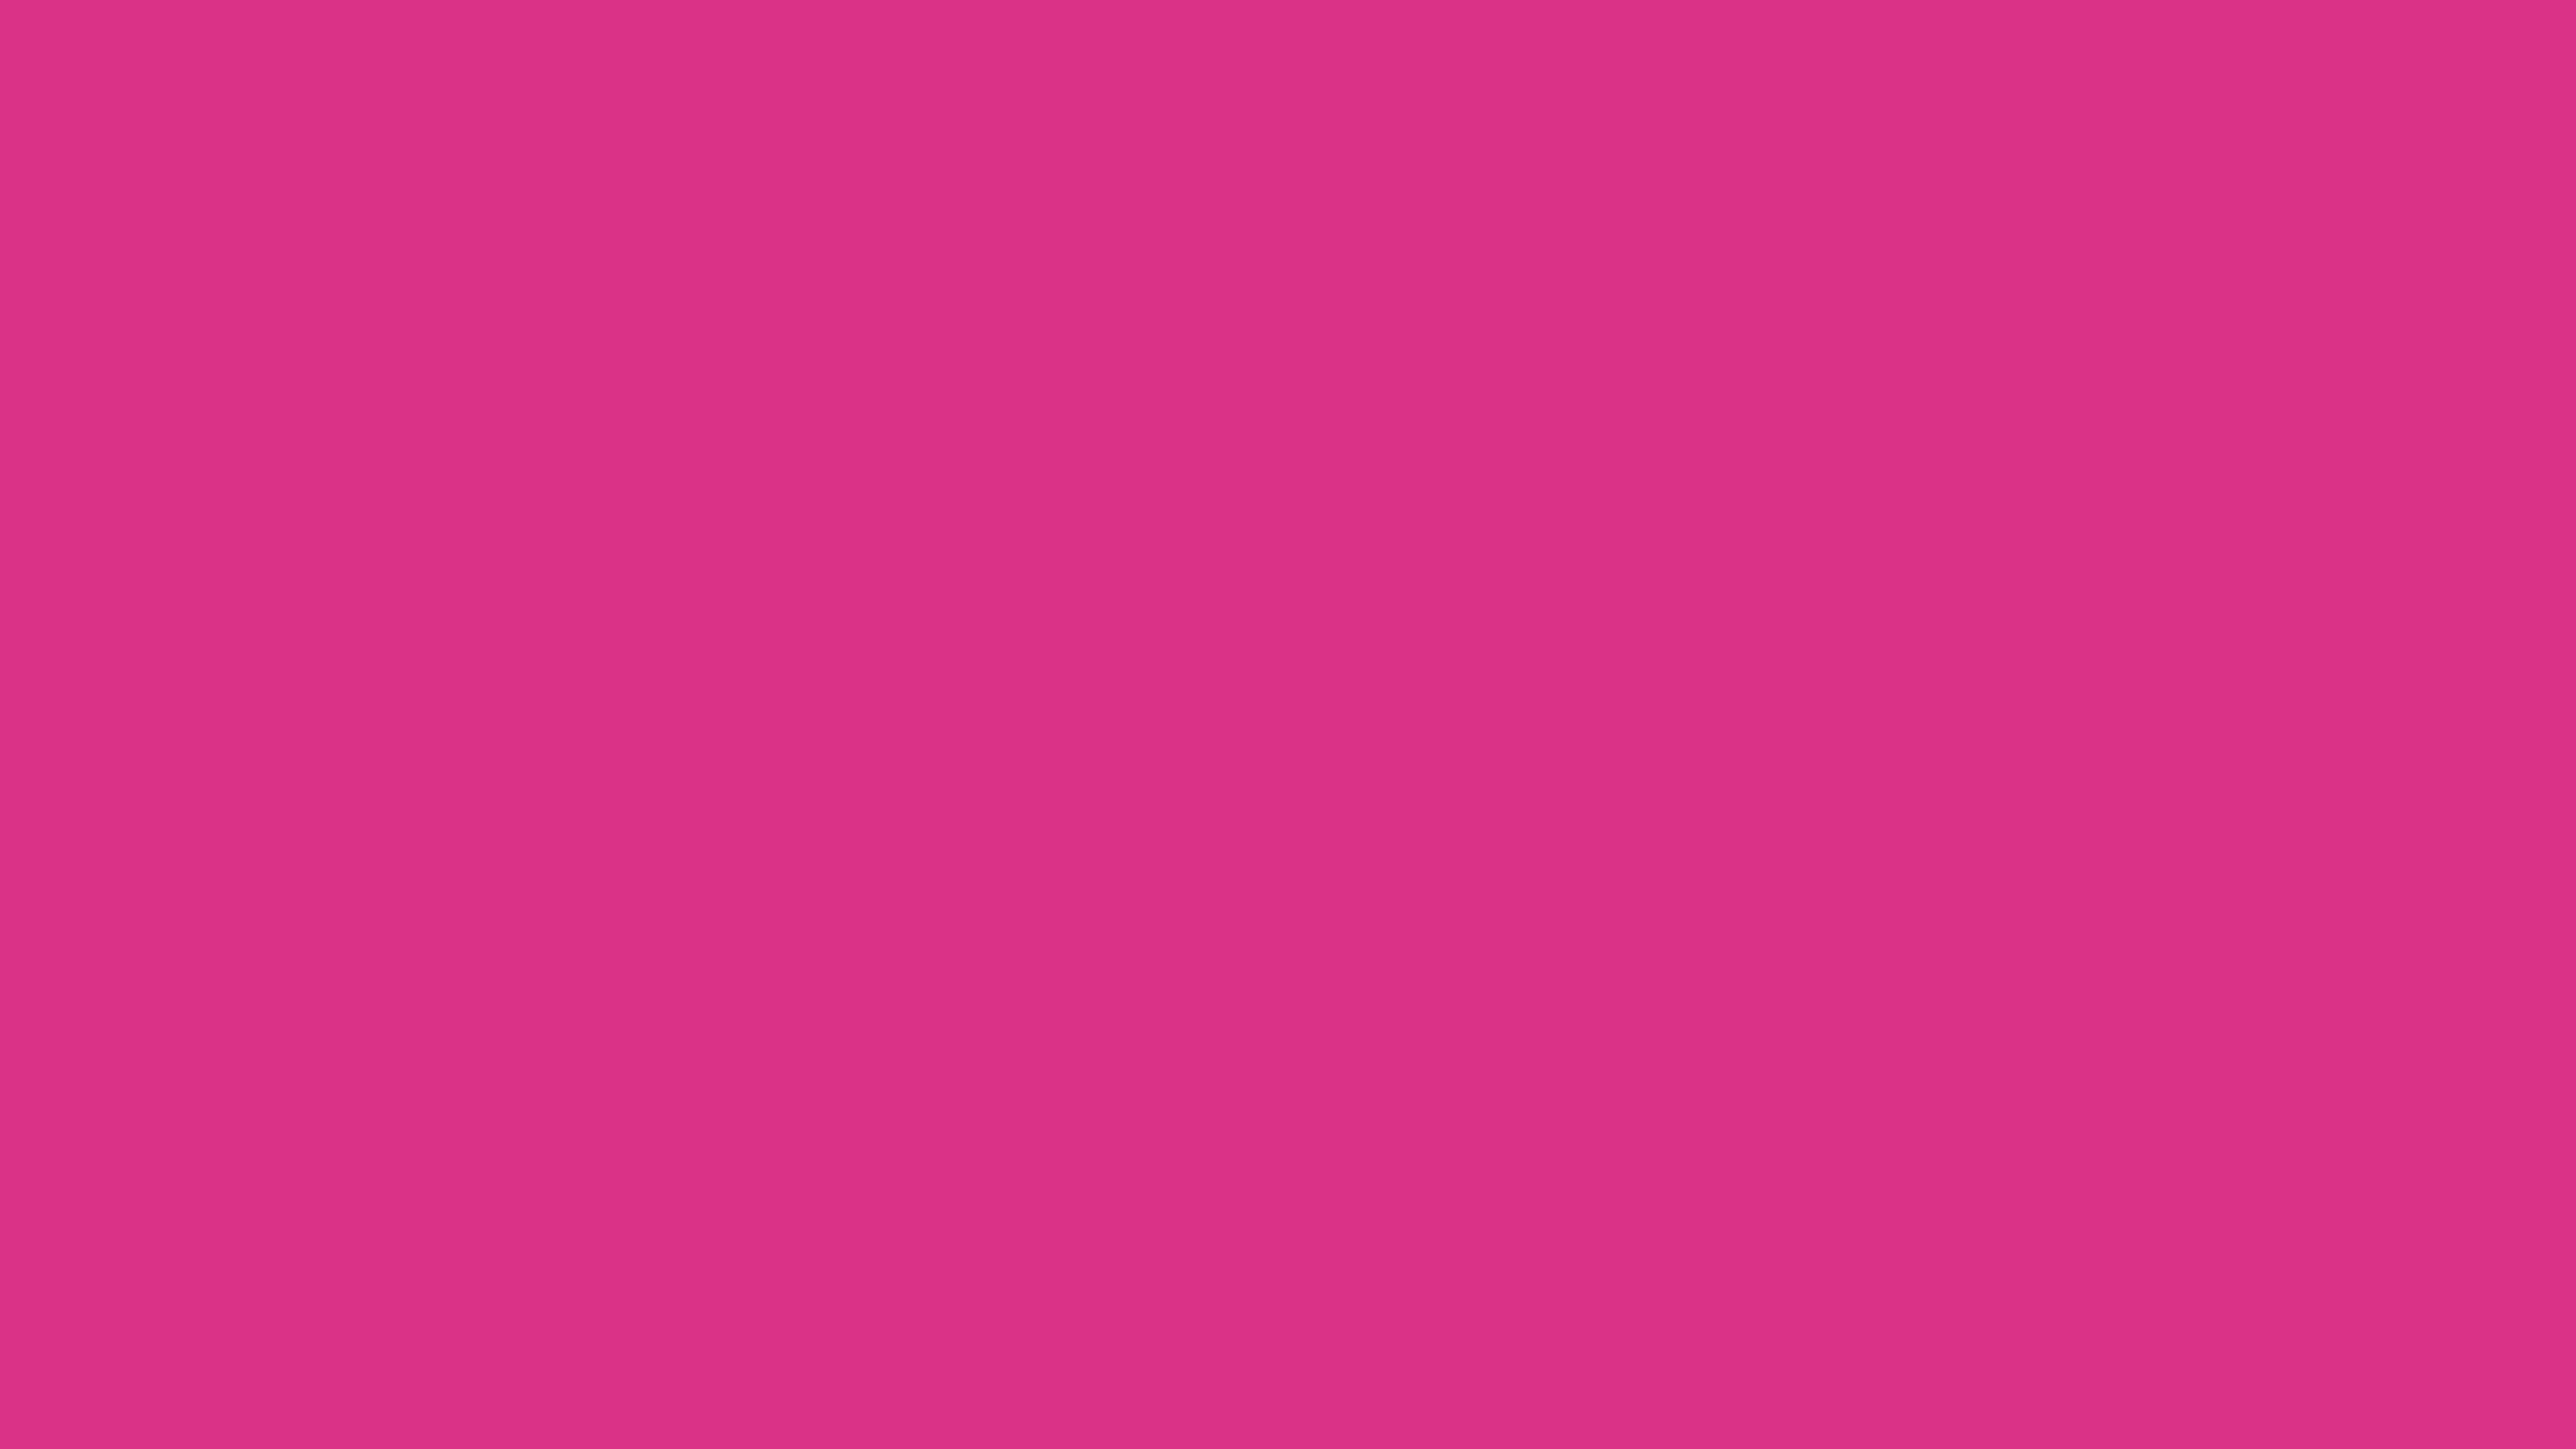 3840x2160 Deep Cerise Solid Color Background